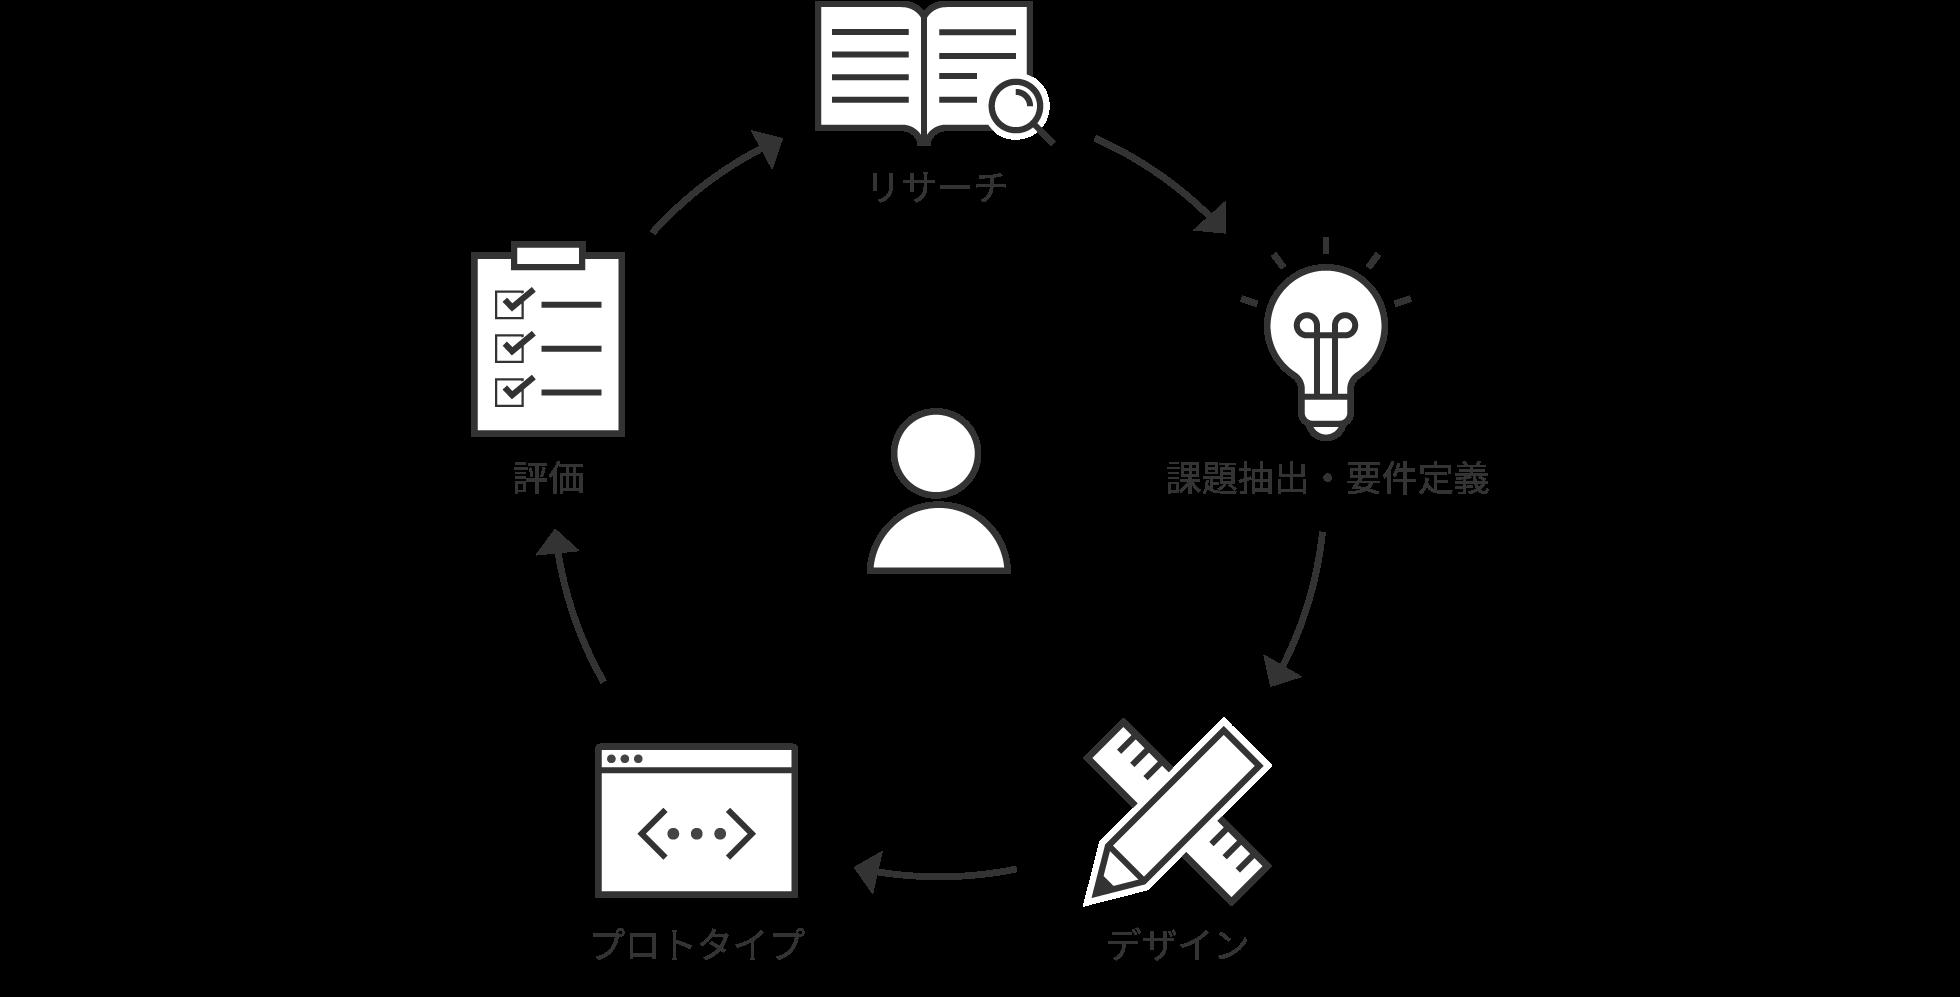 UI/UX設計のサービス特長